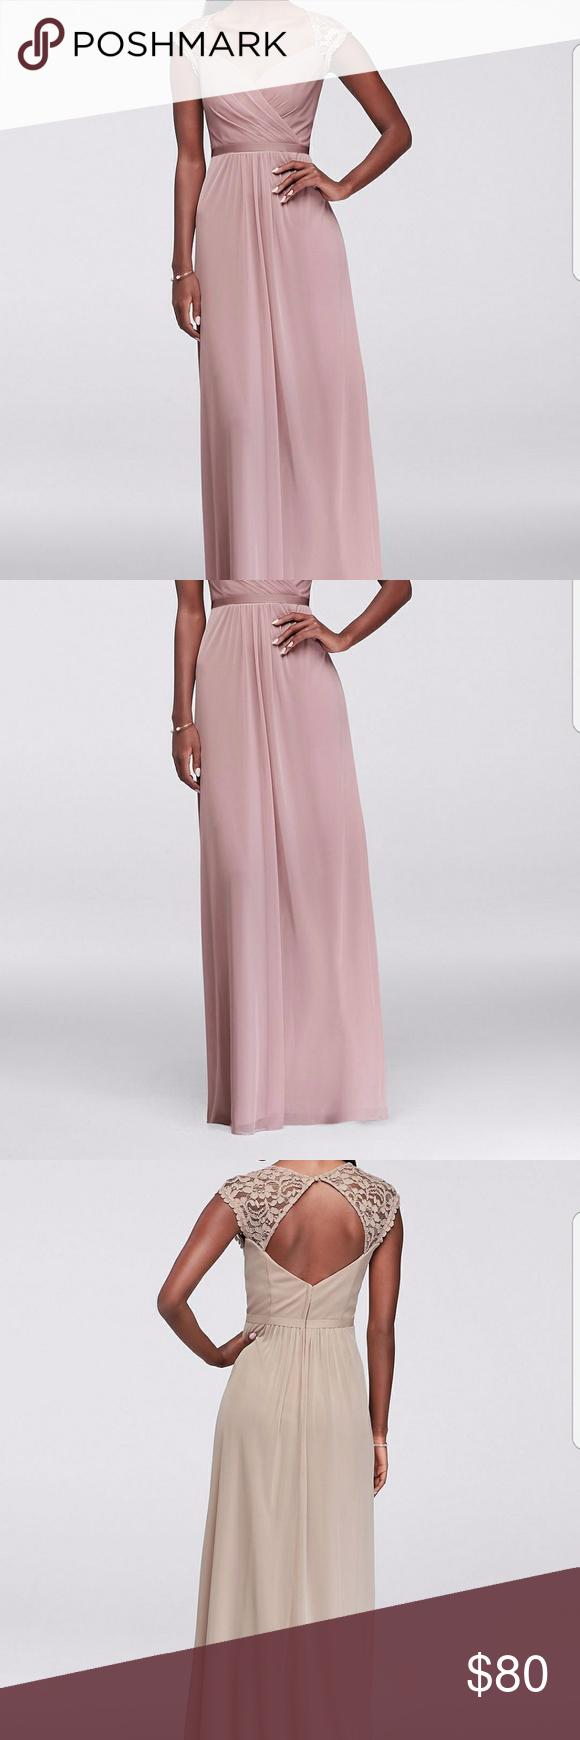 Davidus bridal metallic lace cap sleeve long dress prom heels